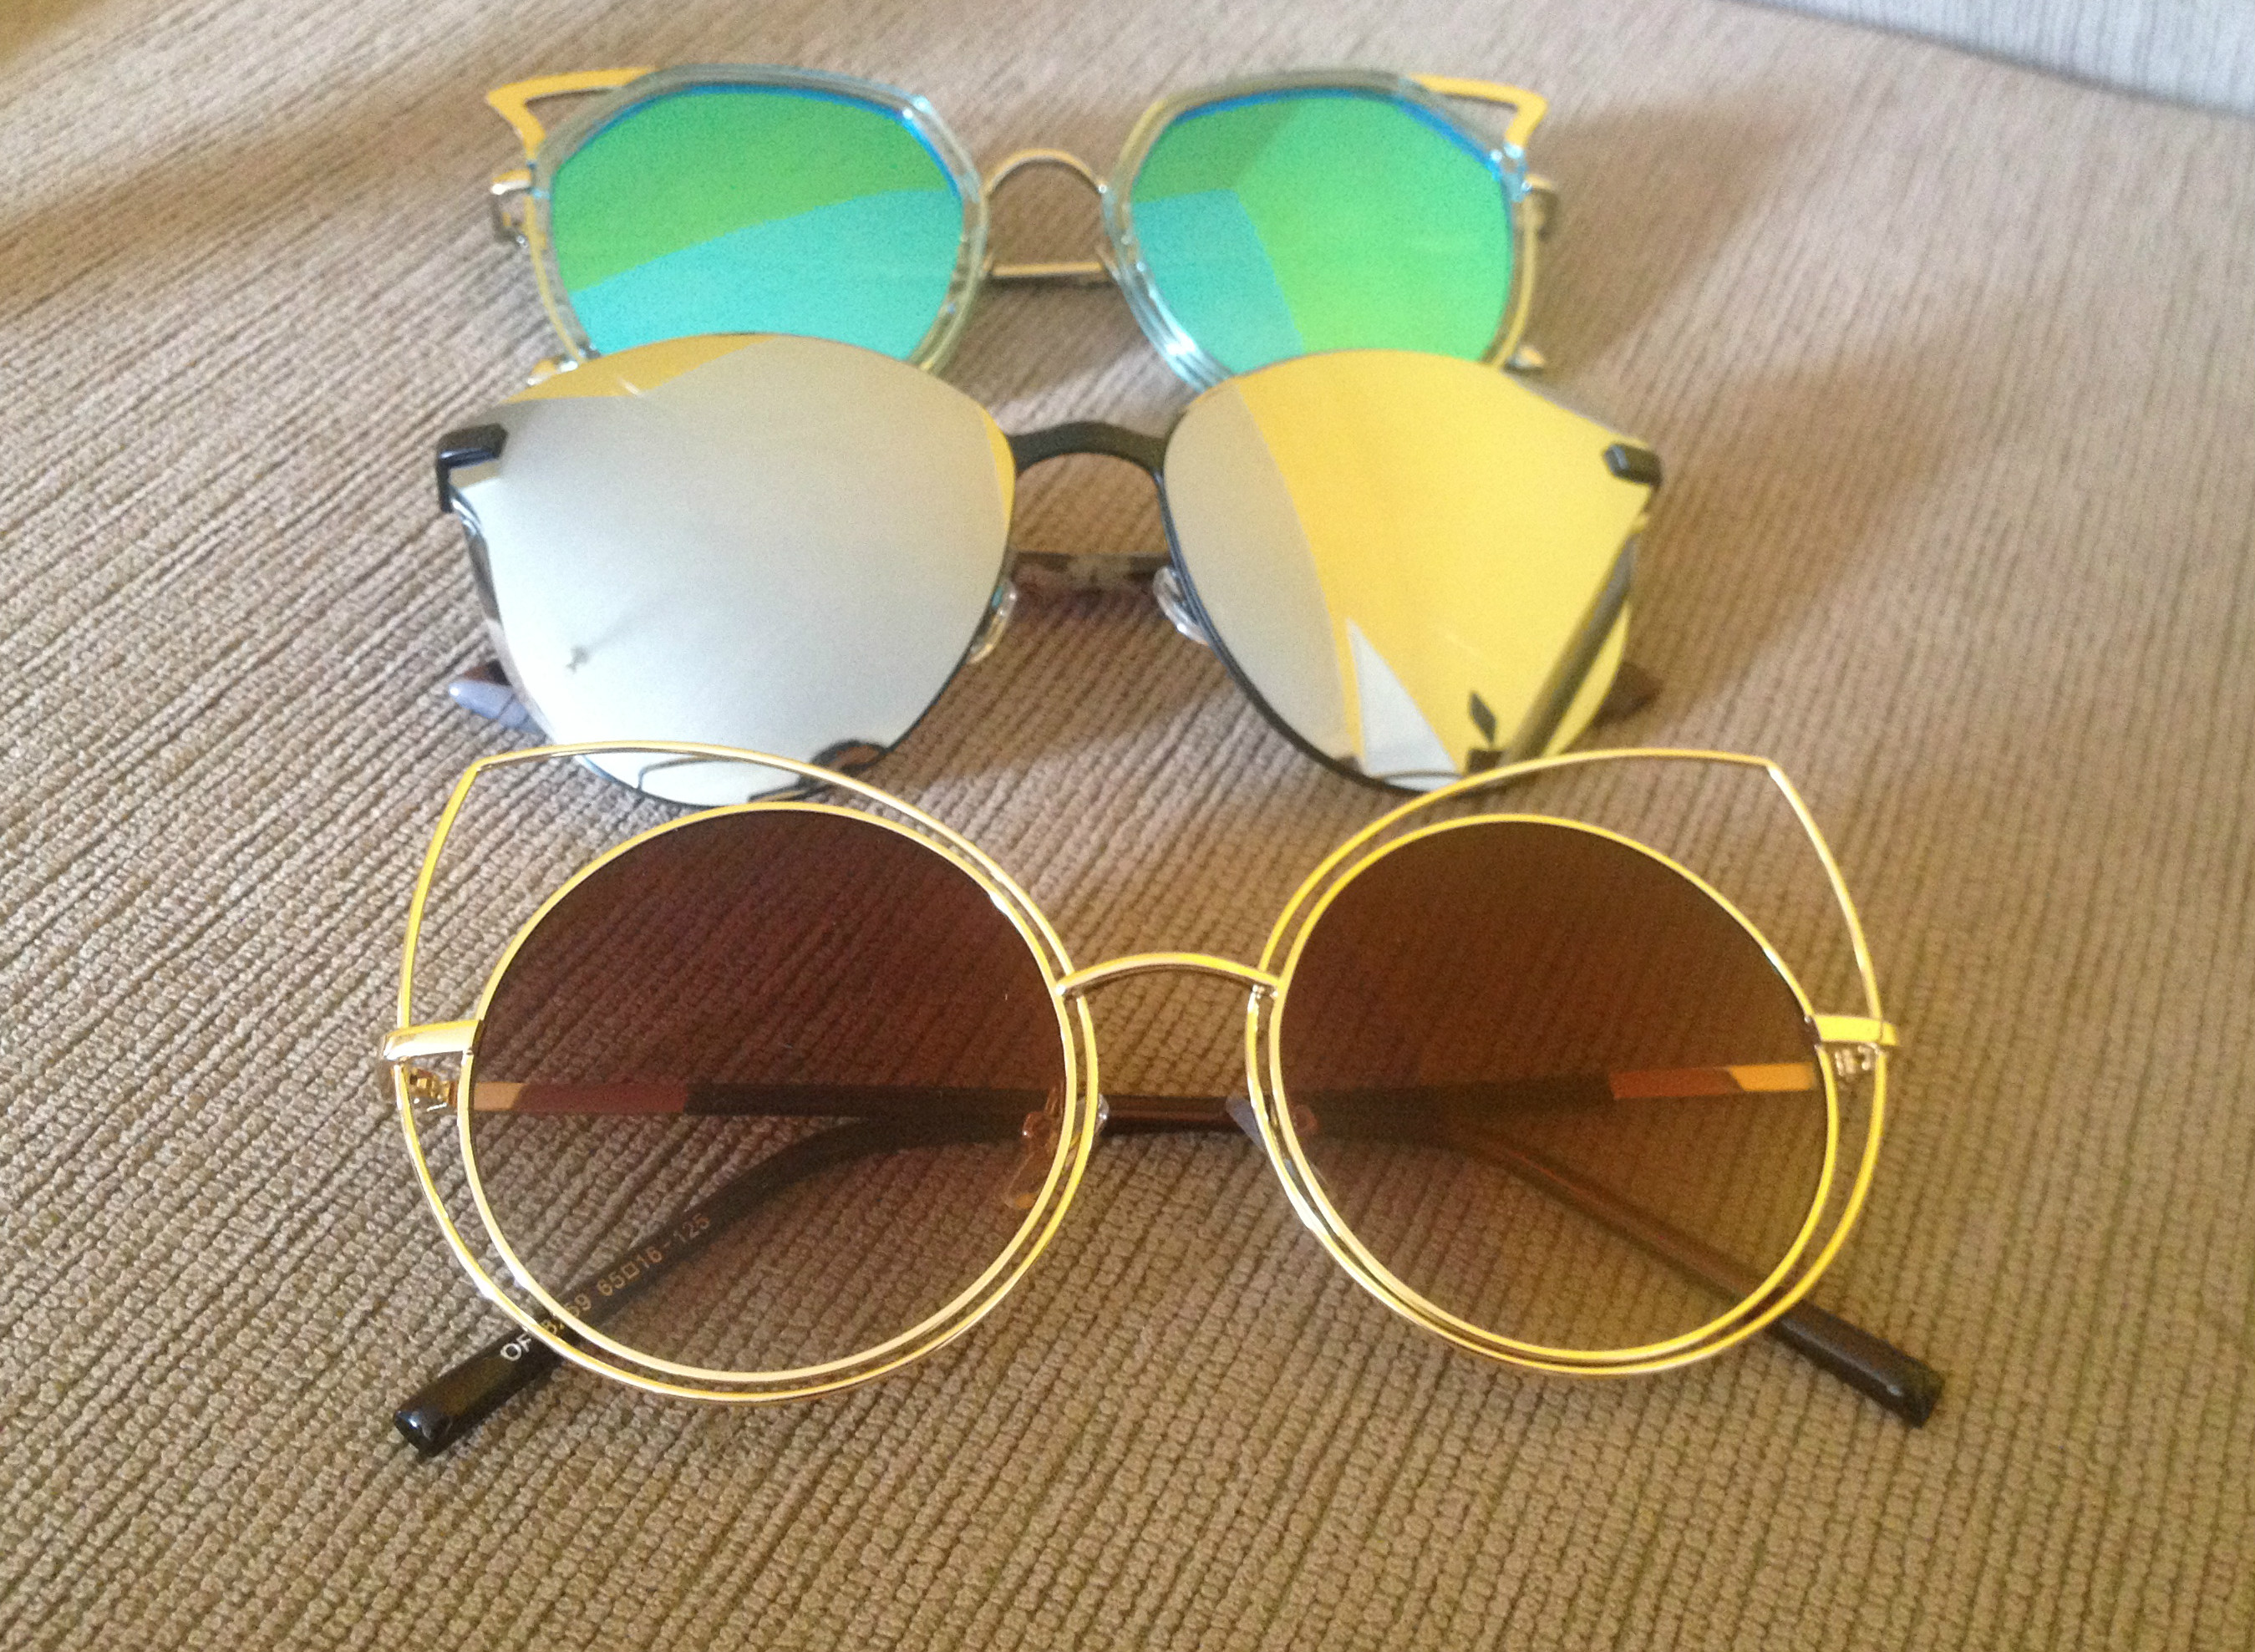 Seasun Club | Óculos modelo gatinho Trend verão 2017